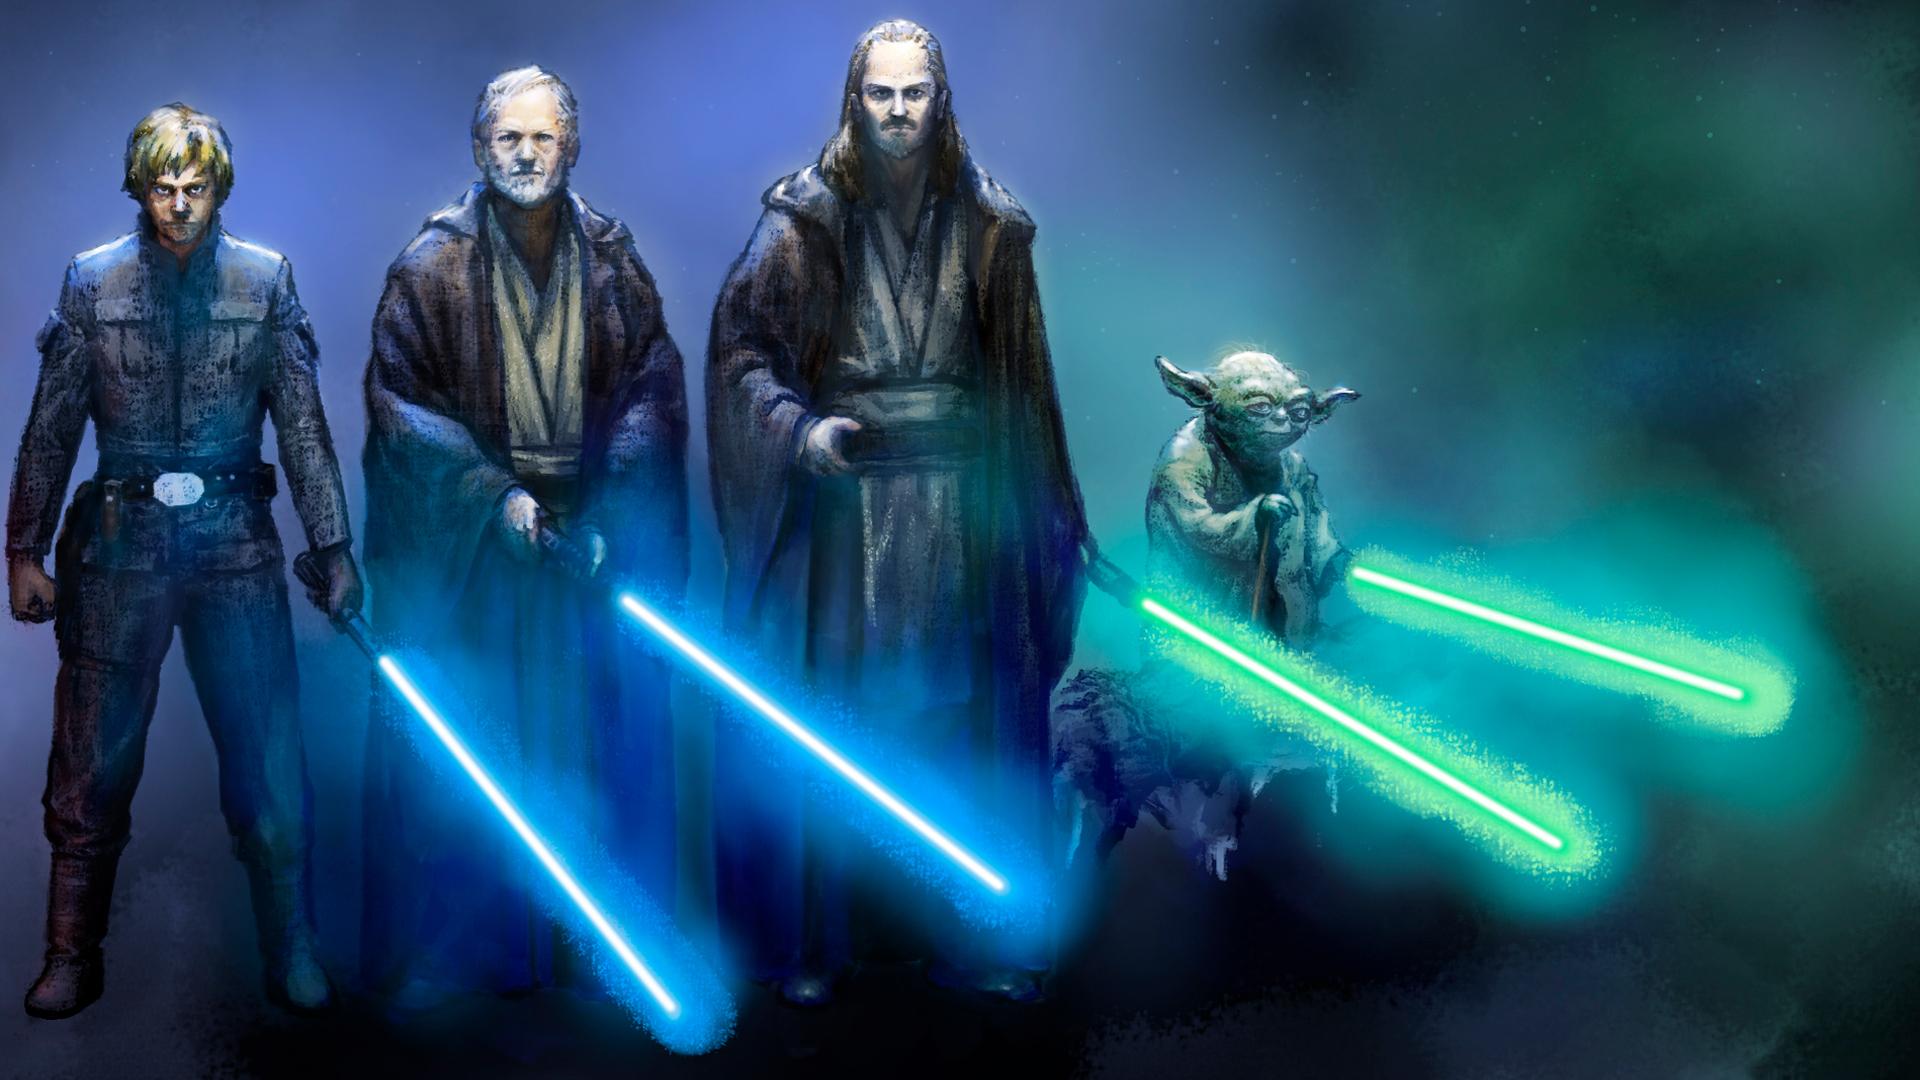 Star Wars Wallpaper   Jedi from Shadow of Death   hosted by Neoseeker 1920x1080